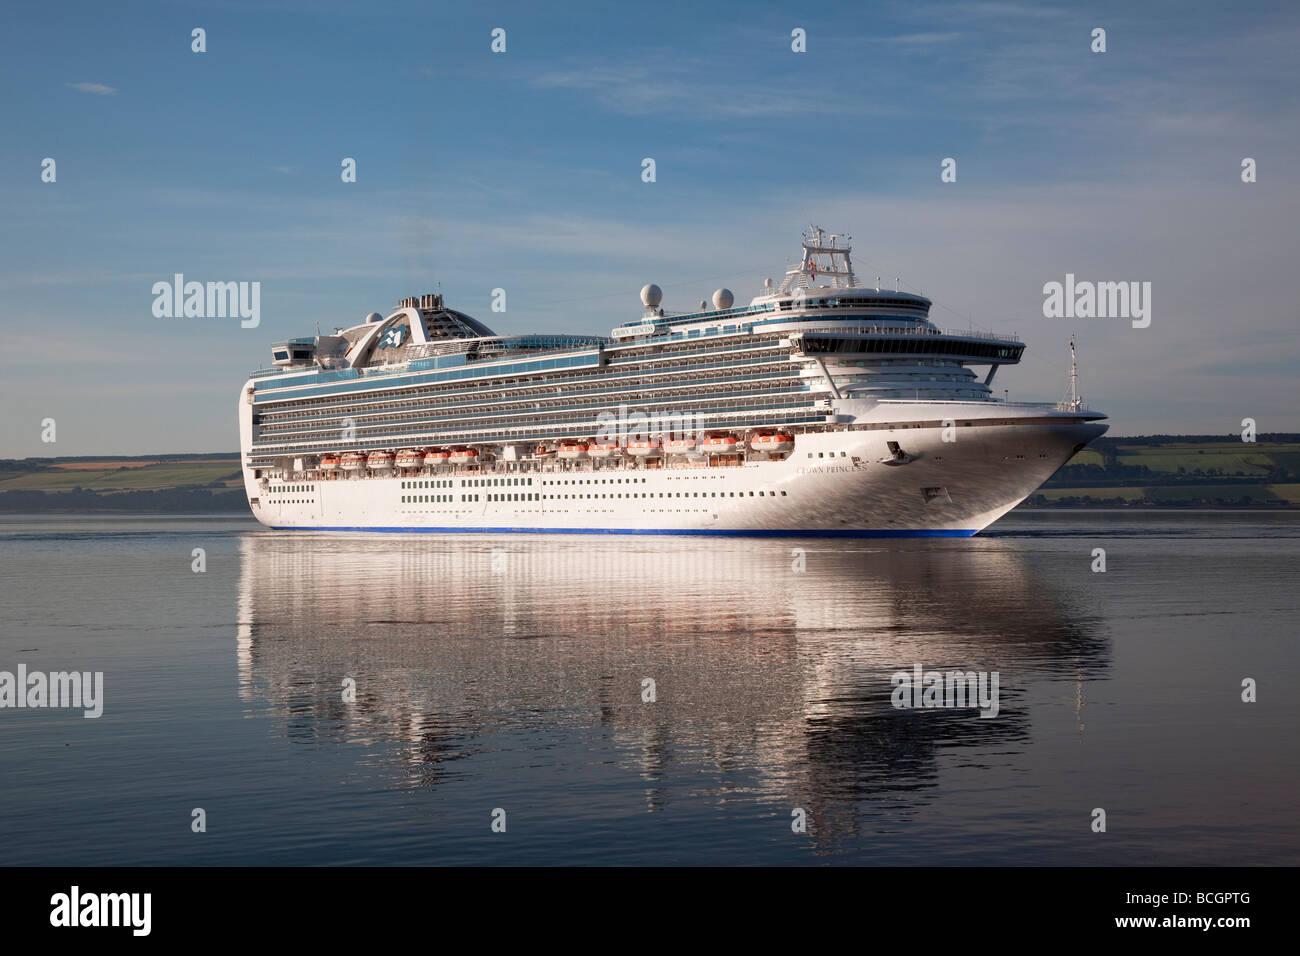 Seascape u0026 Reflections of Cruise ship The